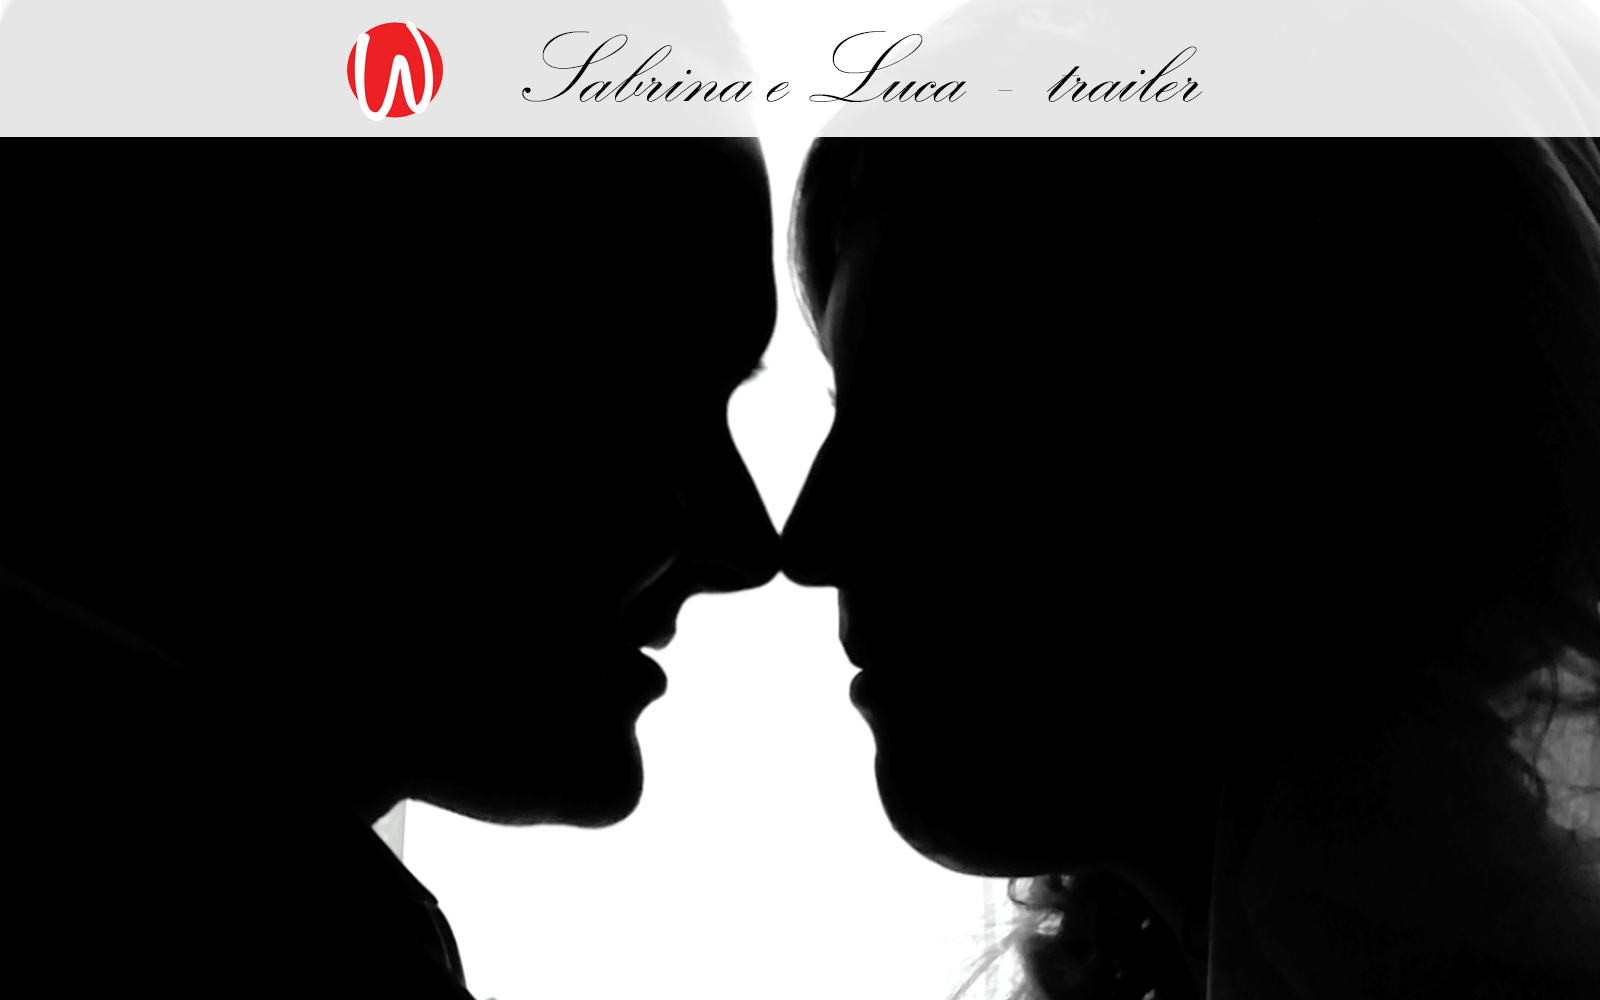 Sabrina & Luca, Trailer